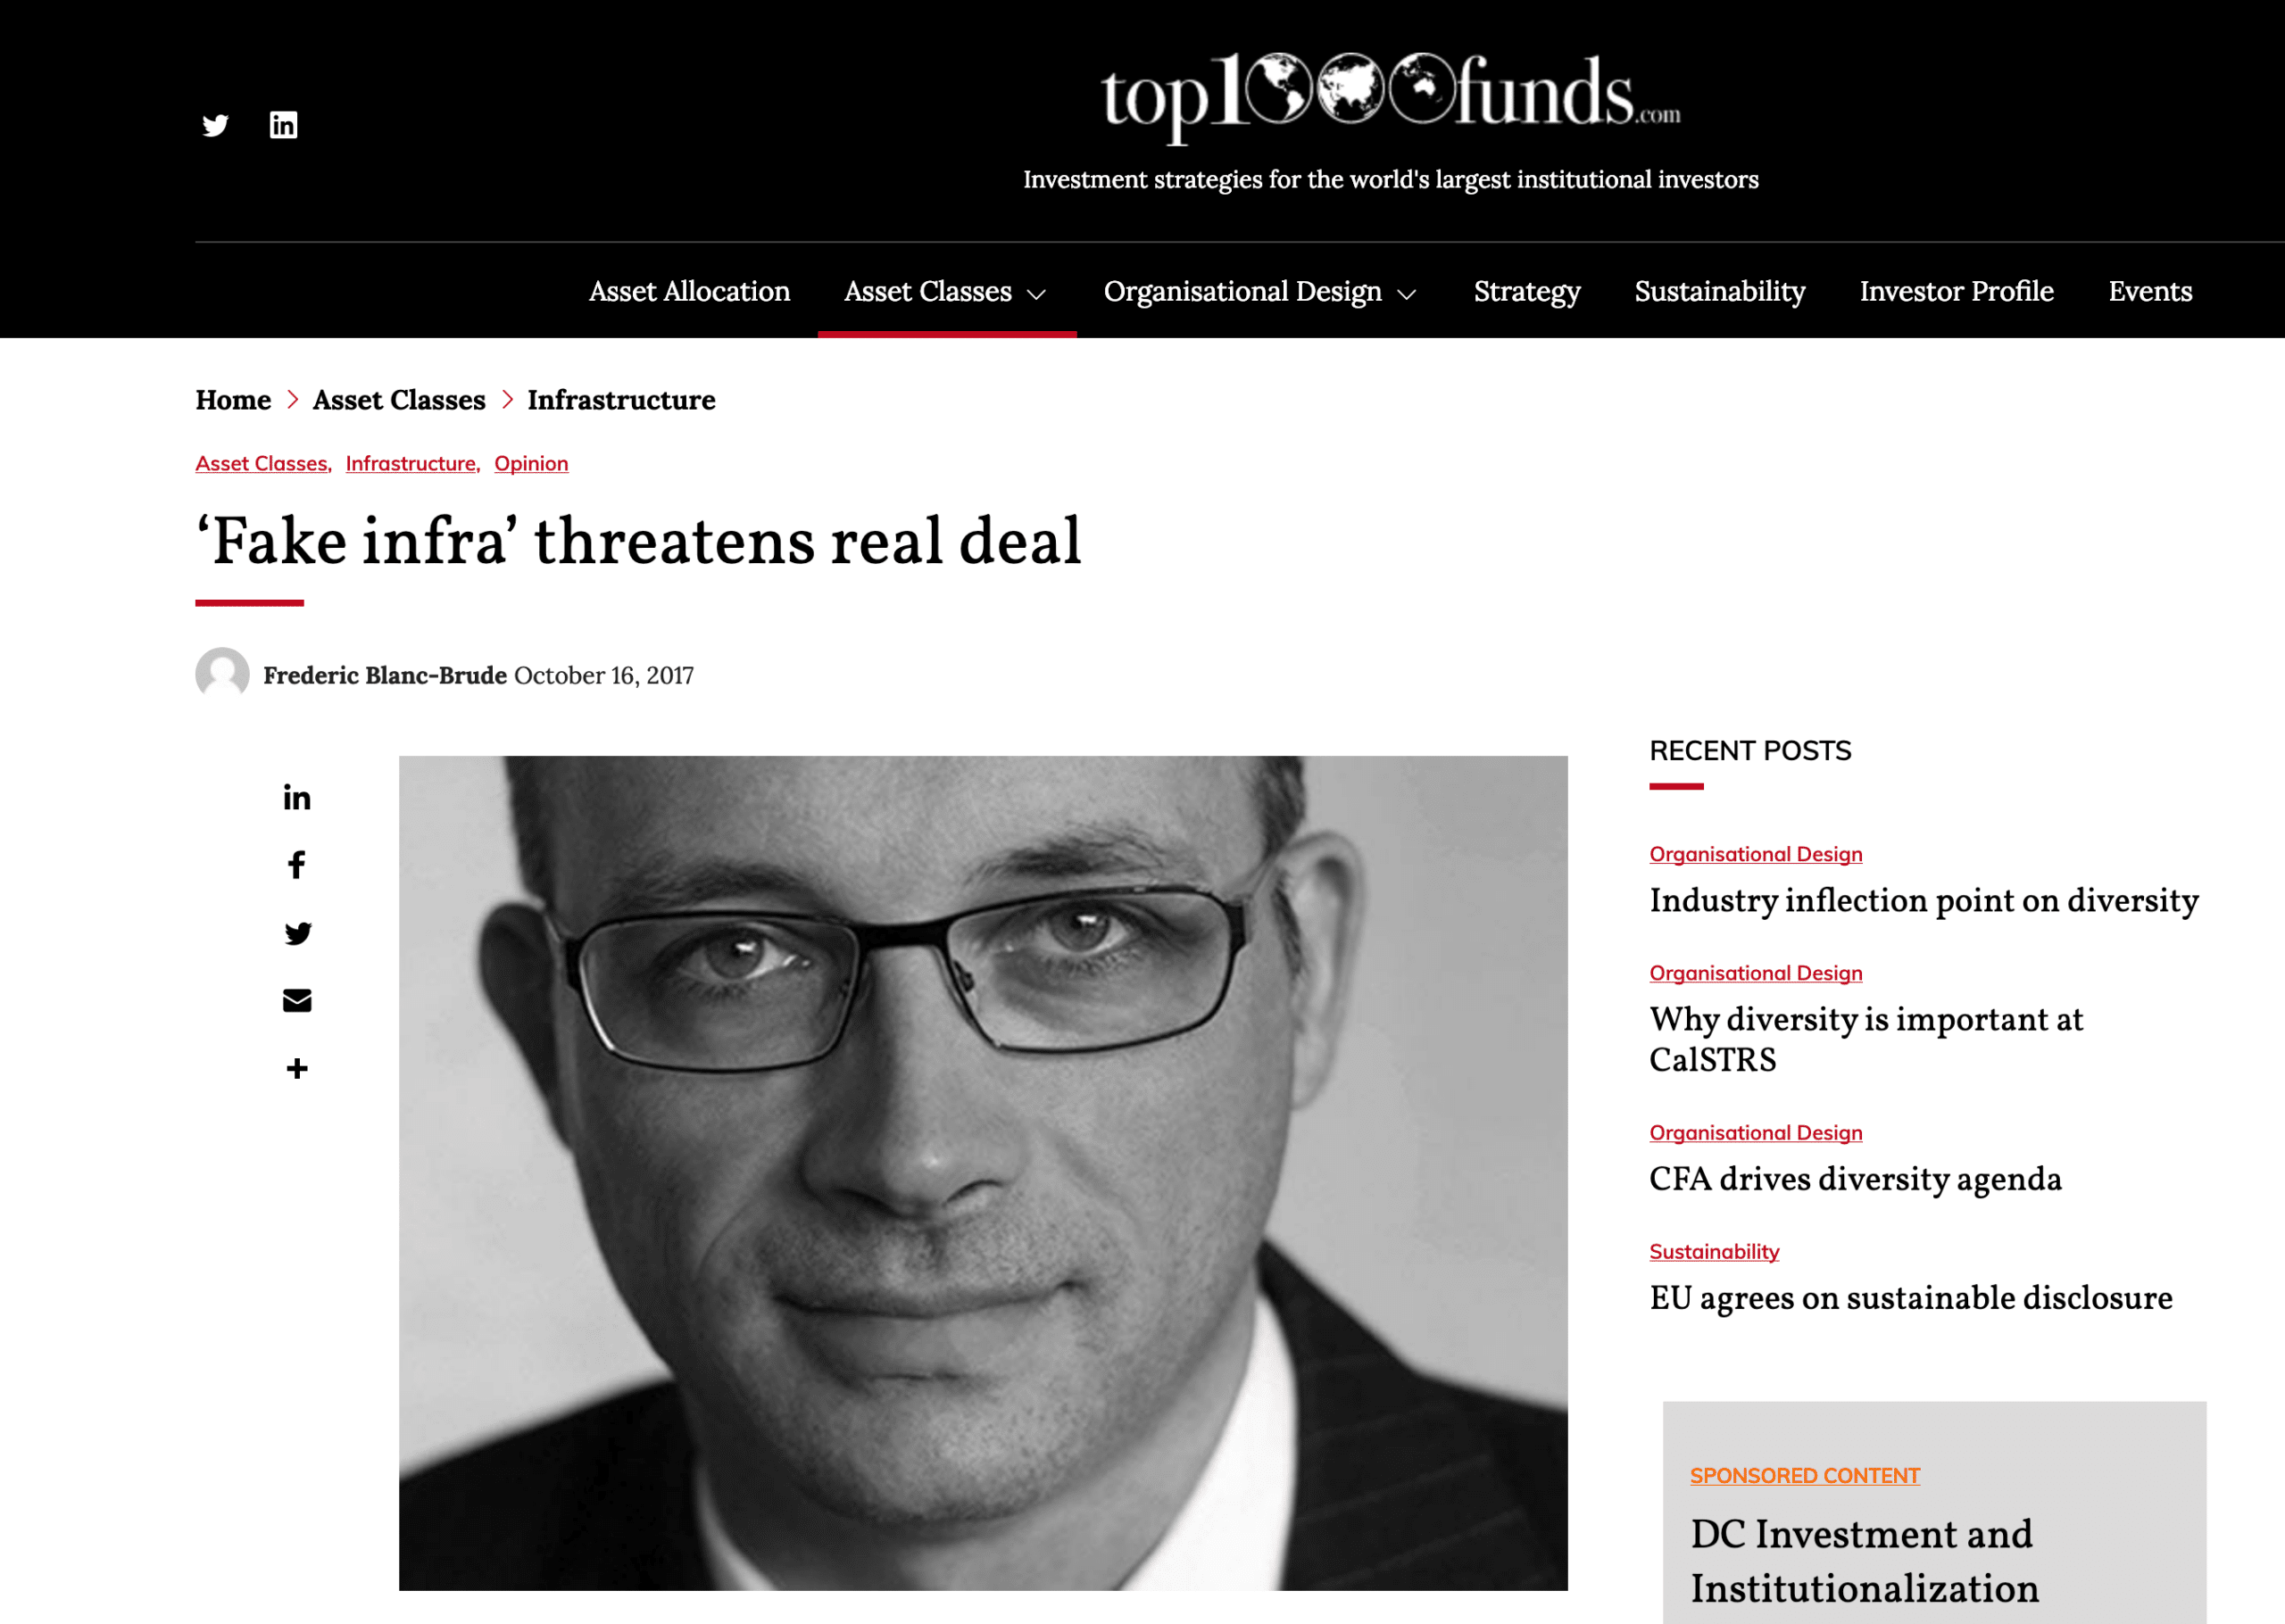 Fake infra threatens real deal